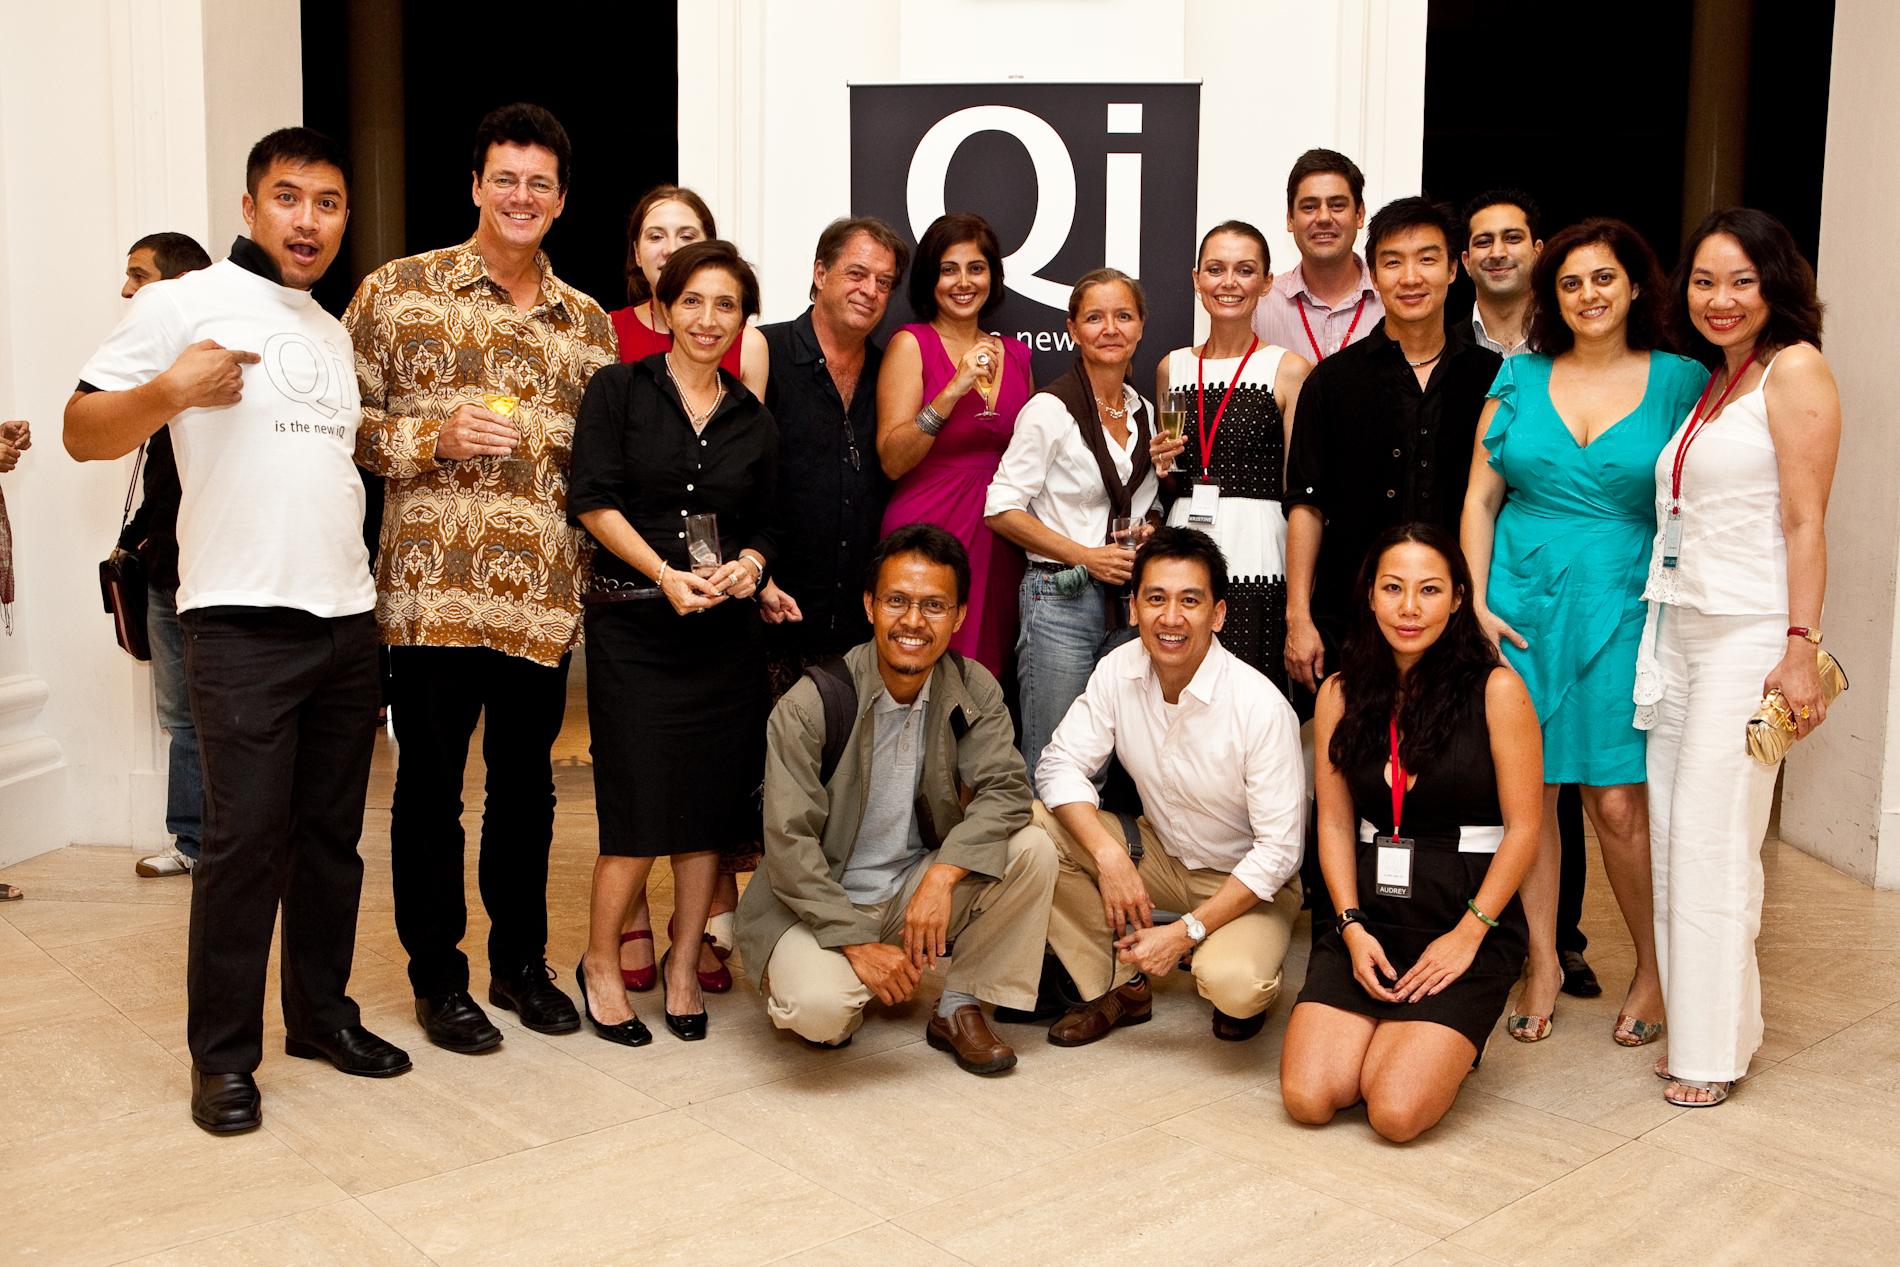 qi-global-2009-sustaible-design-singapore-170.jpg